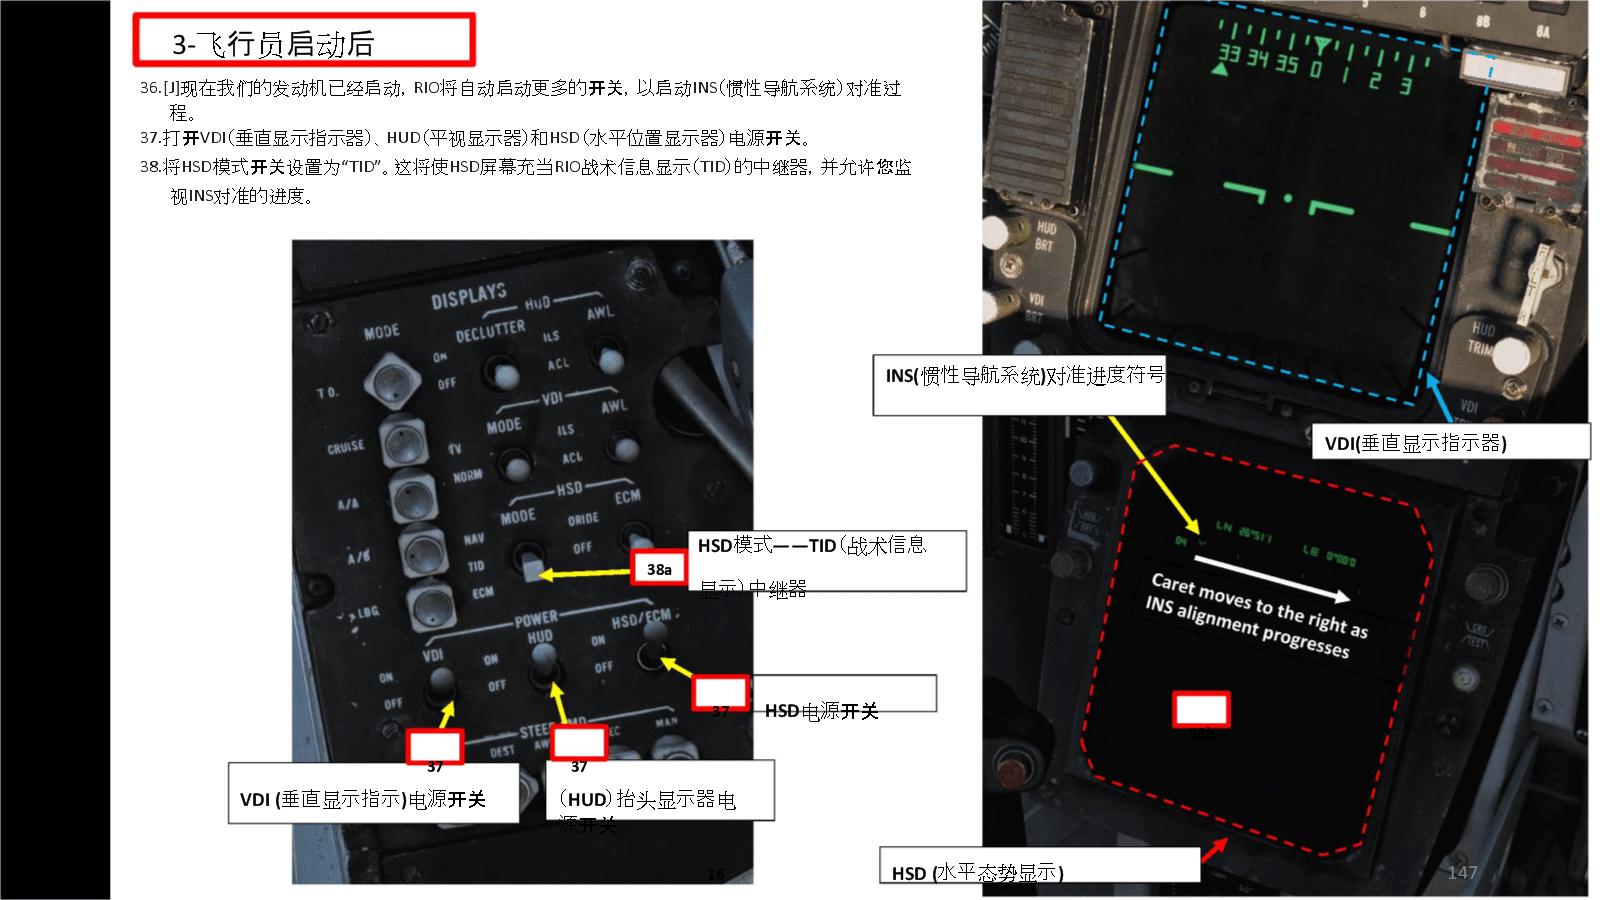 DCS F 14B Tomcat雄猫战斗机 中文指南 4.3飞行员启动后.docx